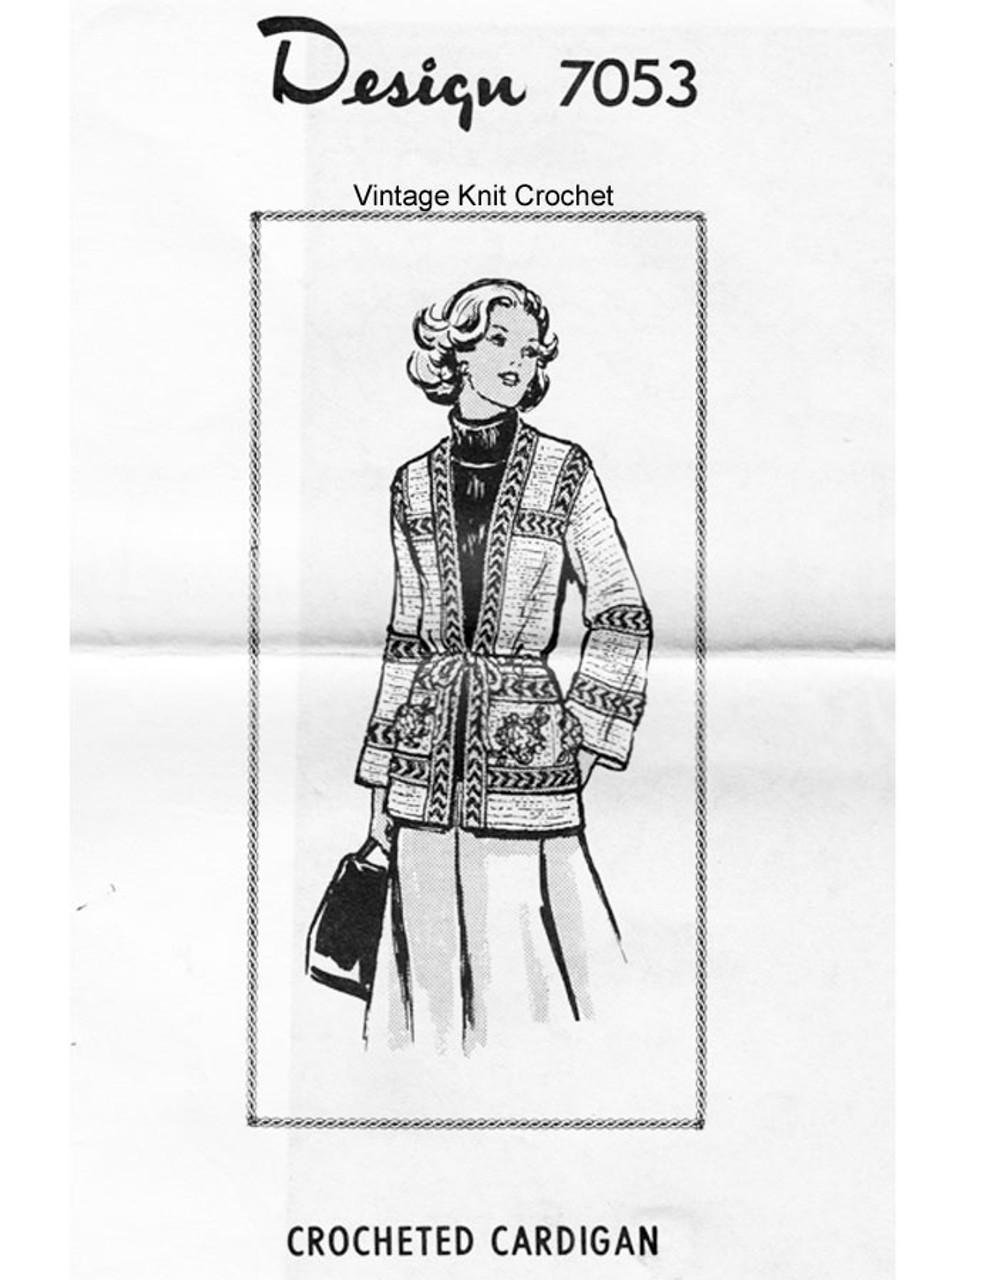 Crochet Cardigan Pattern, Rose Pockets, Mail Order 7053